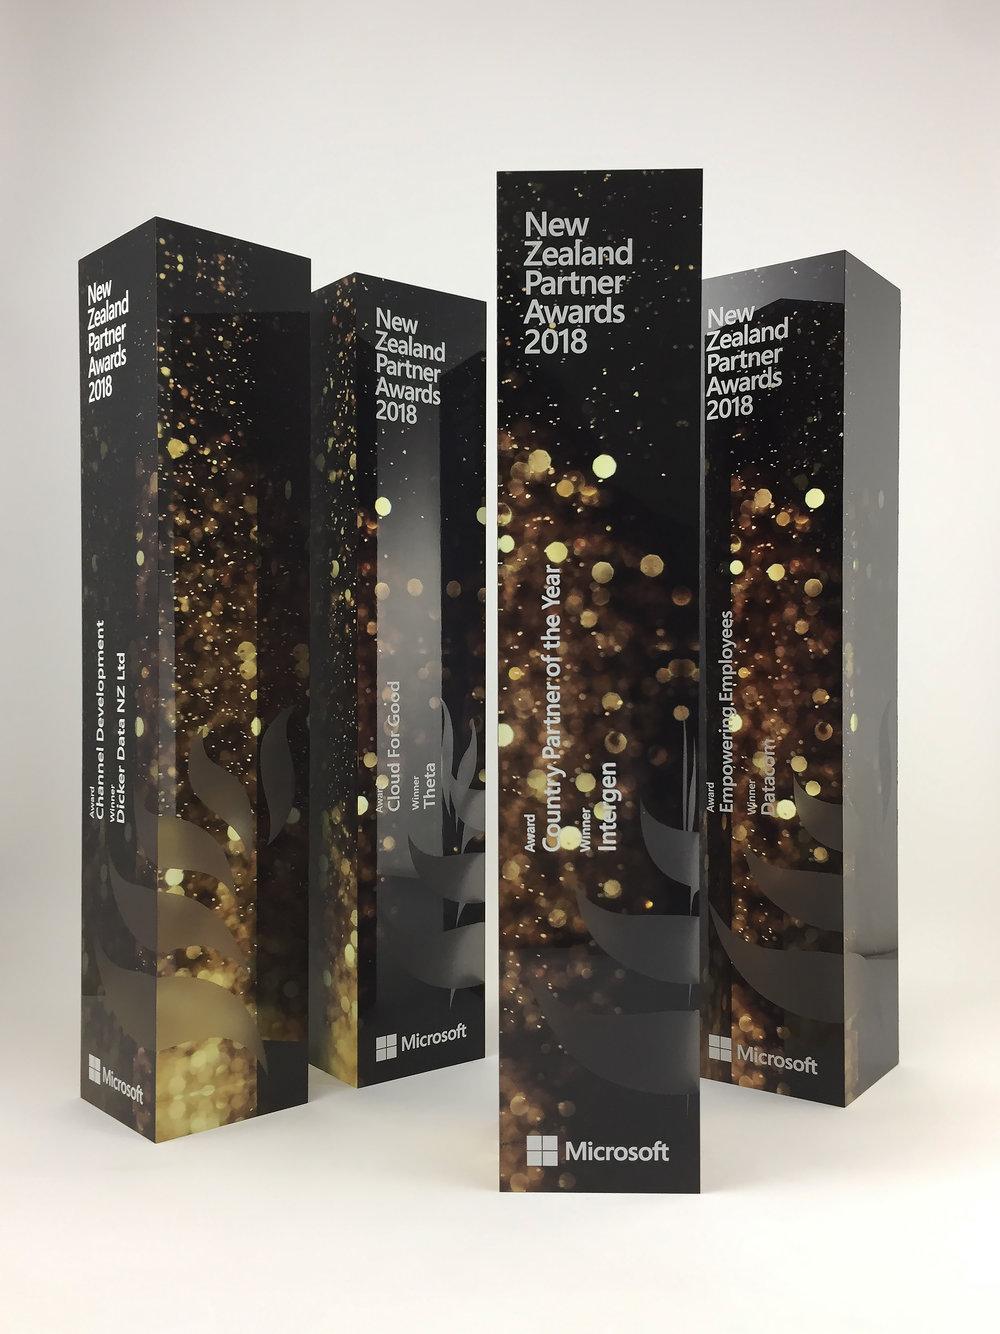 microsoft-newzealand-partner-awards-acrylic-2018-01.jpg